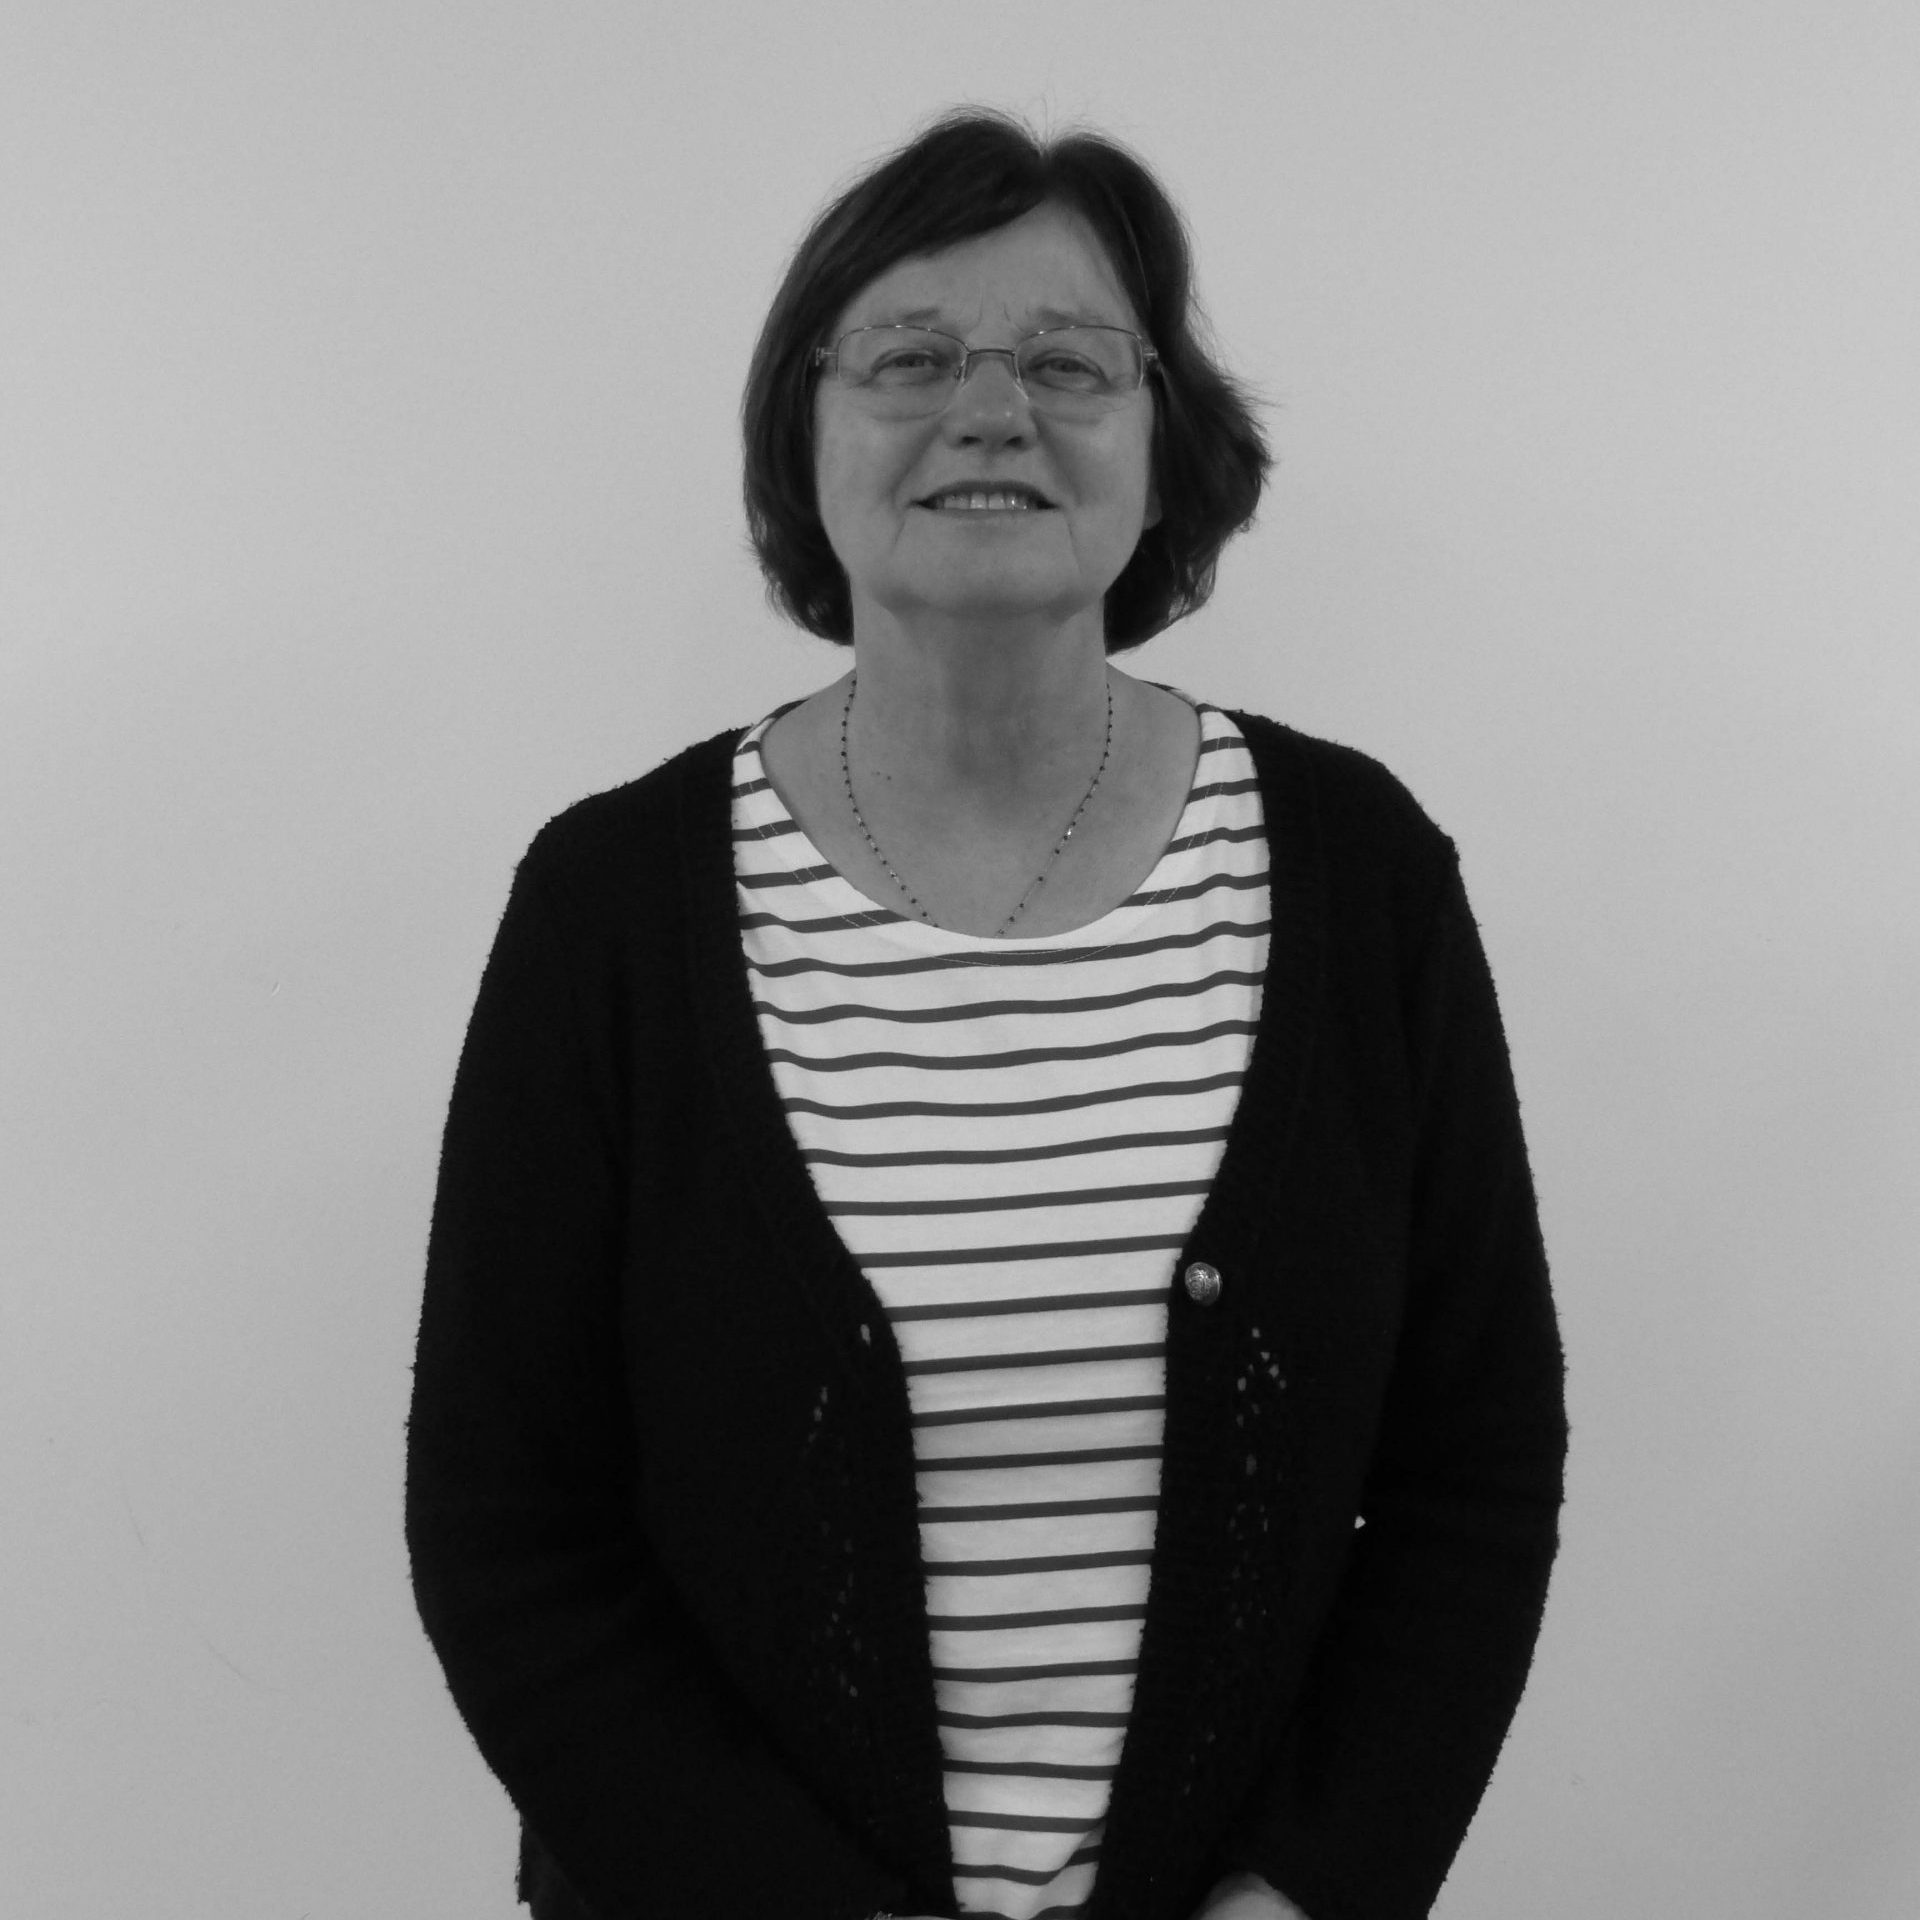 Françoise Raulo